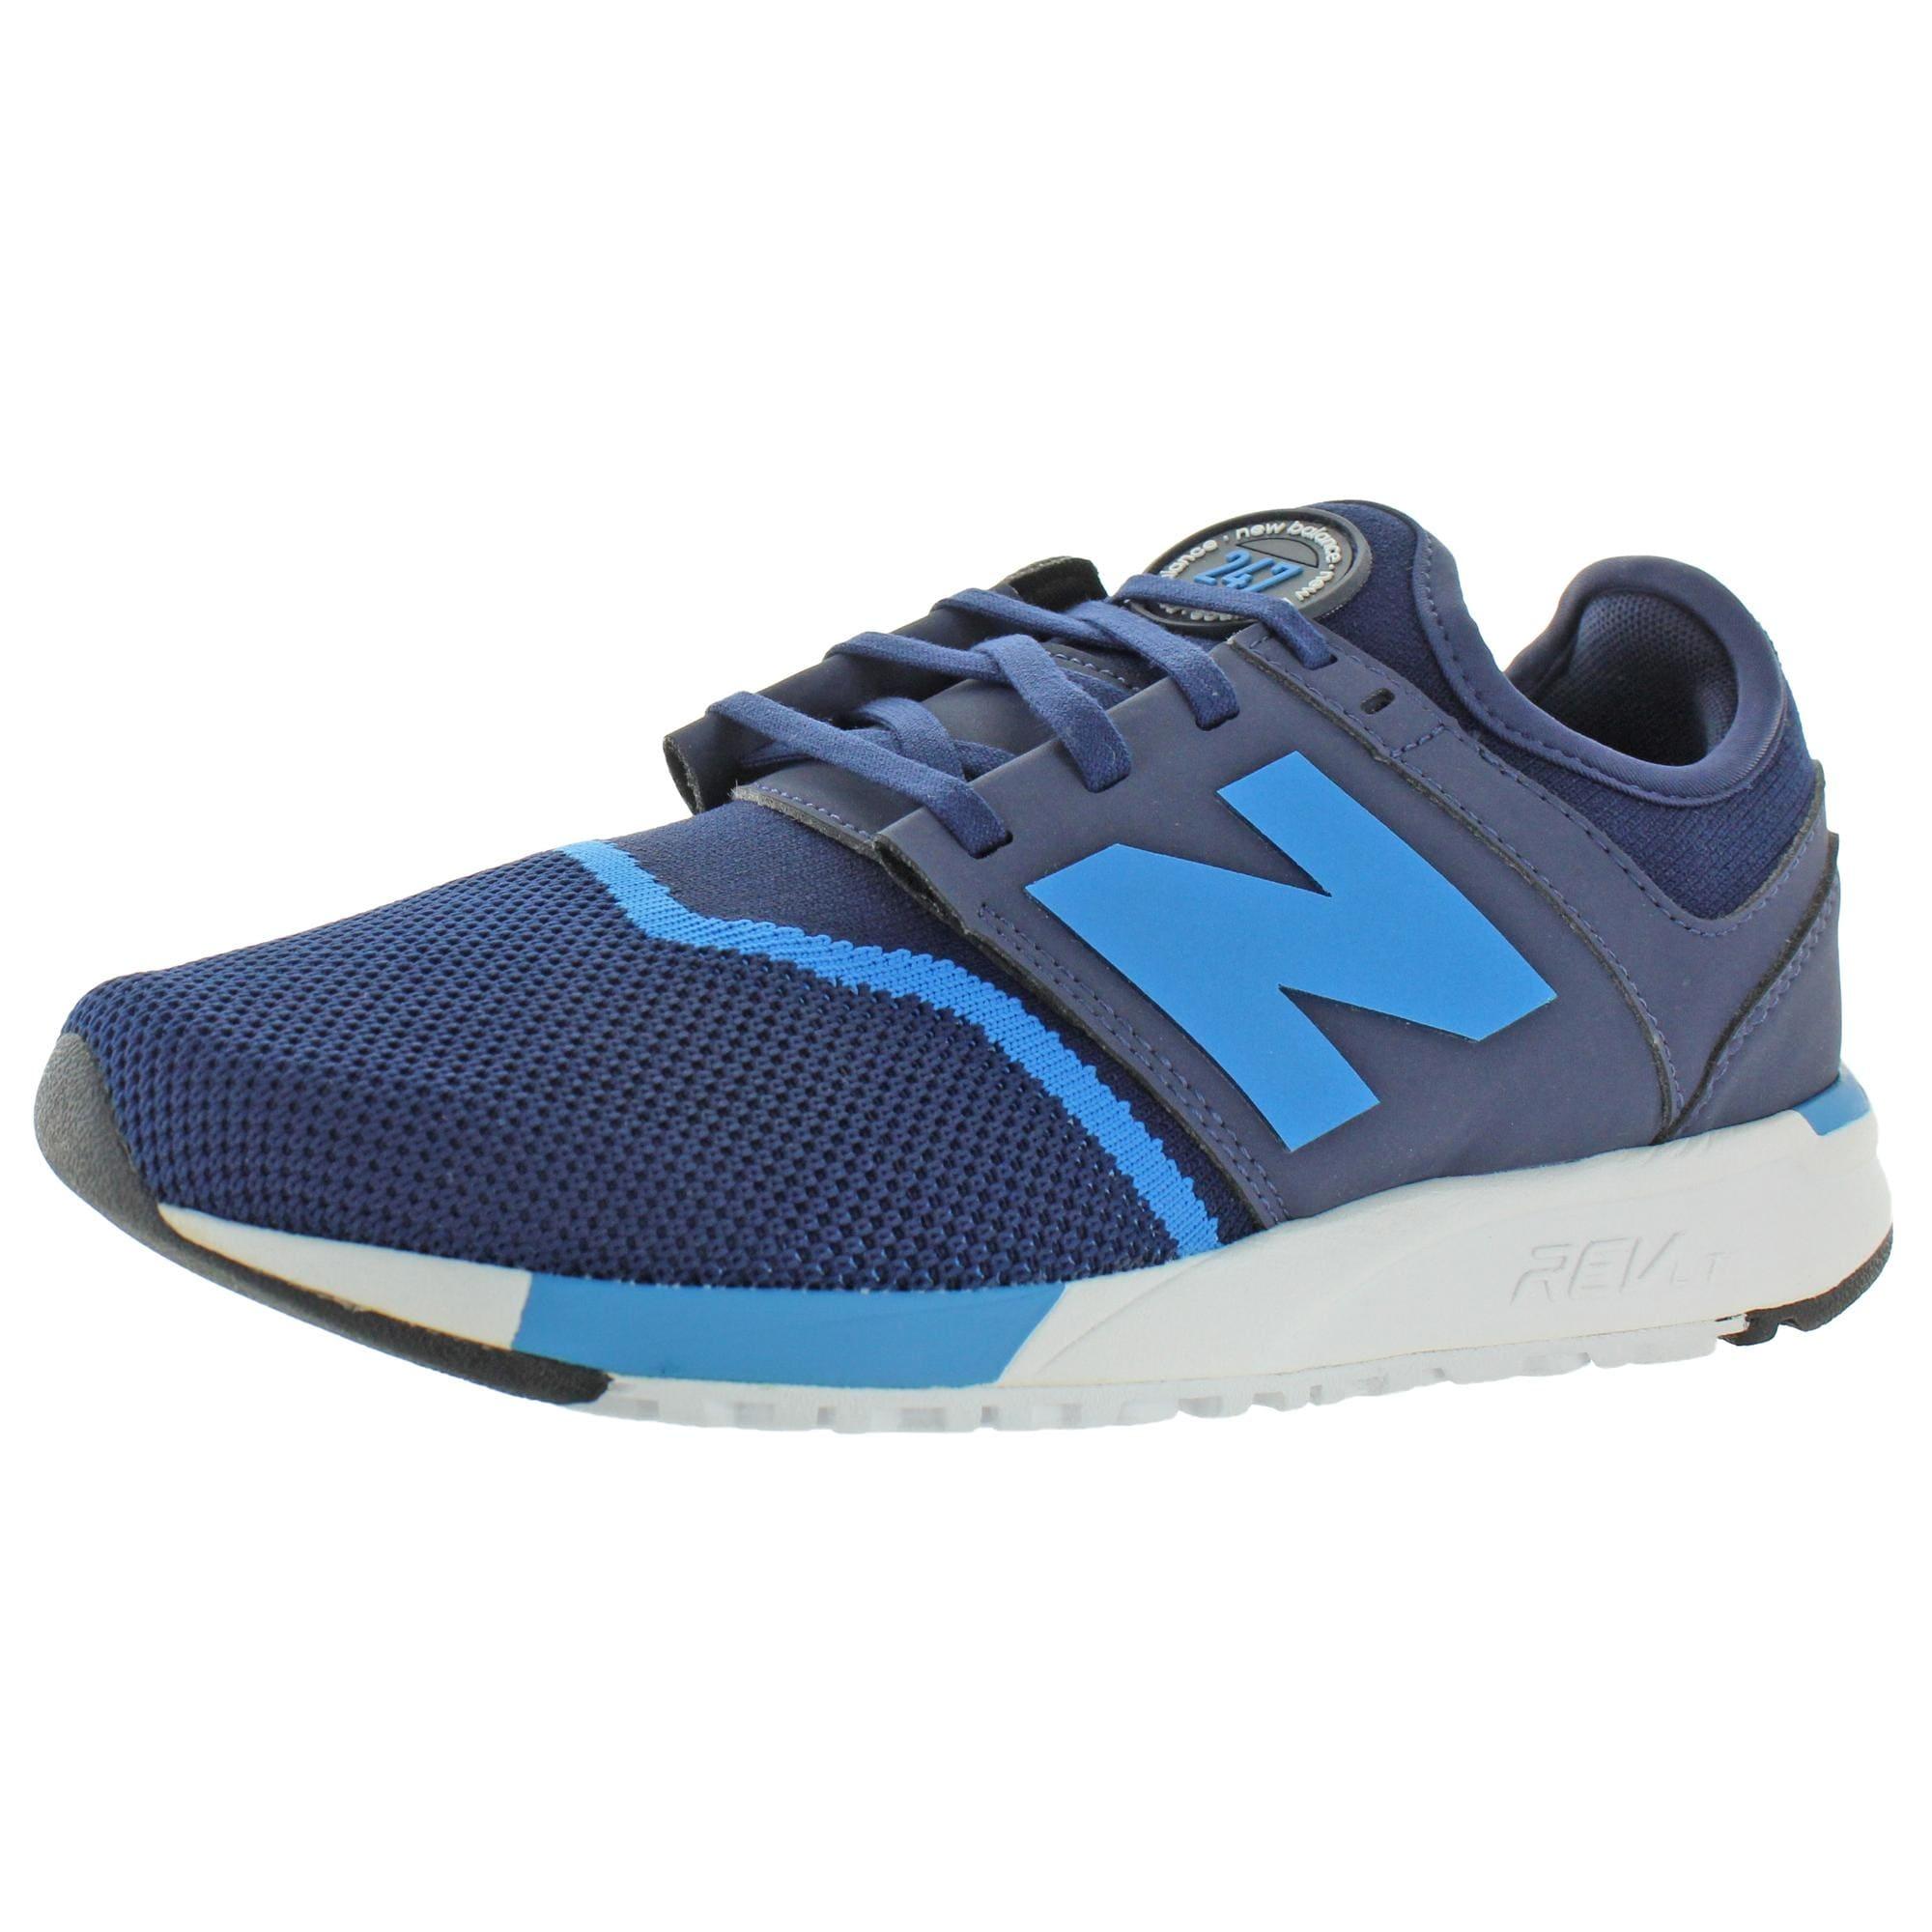 New Balance Men's MRL247 Mesh REVlite Athletic Sneakers Shoes